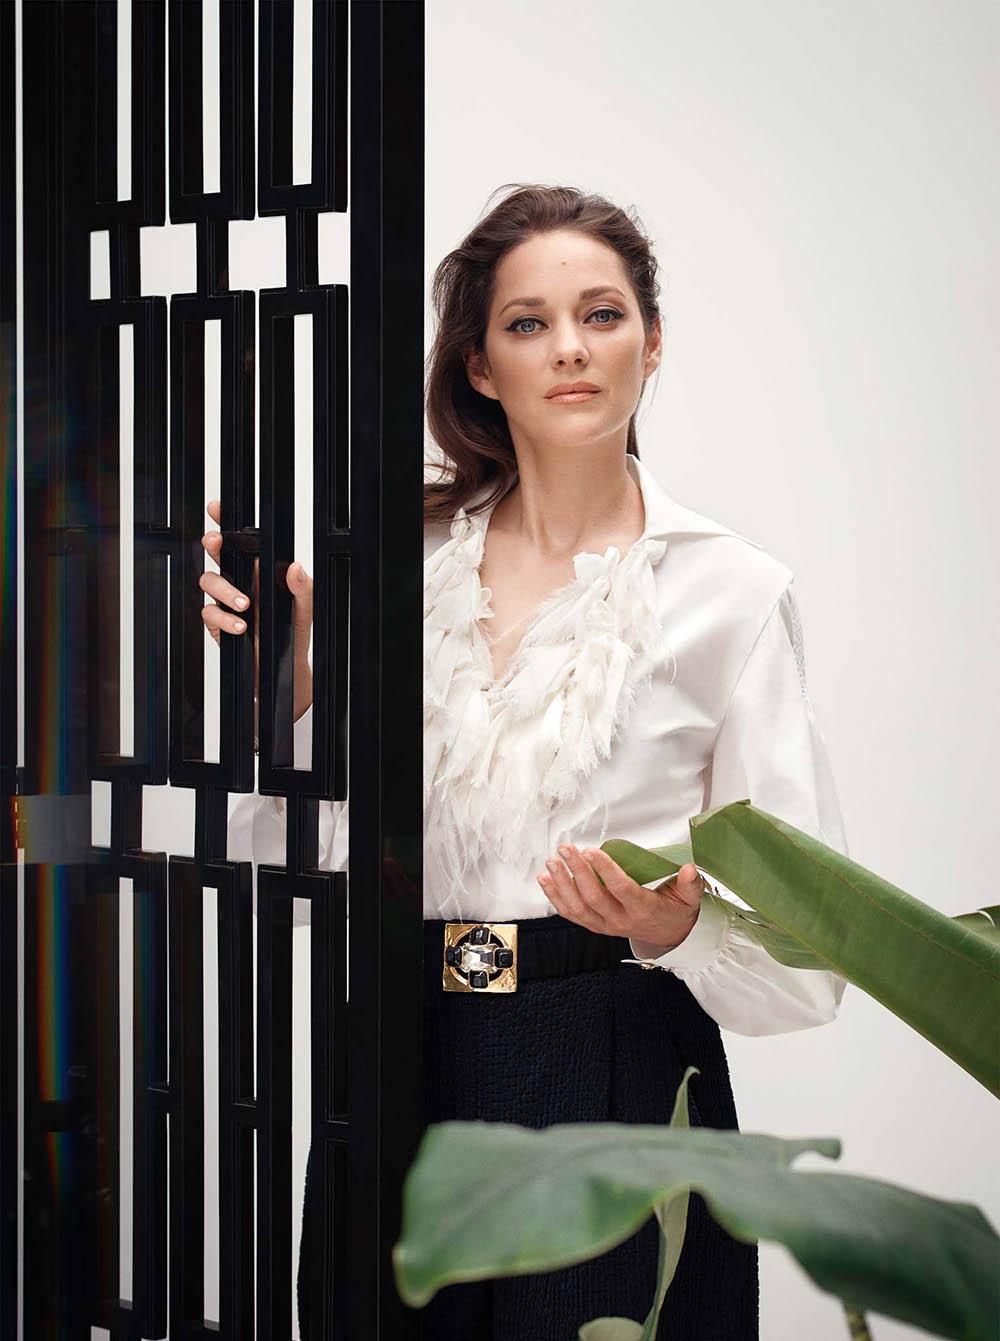 Marion Cotillard covers Harper's Bazaar UK October 2020 by Serge Leblon